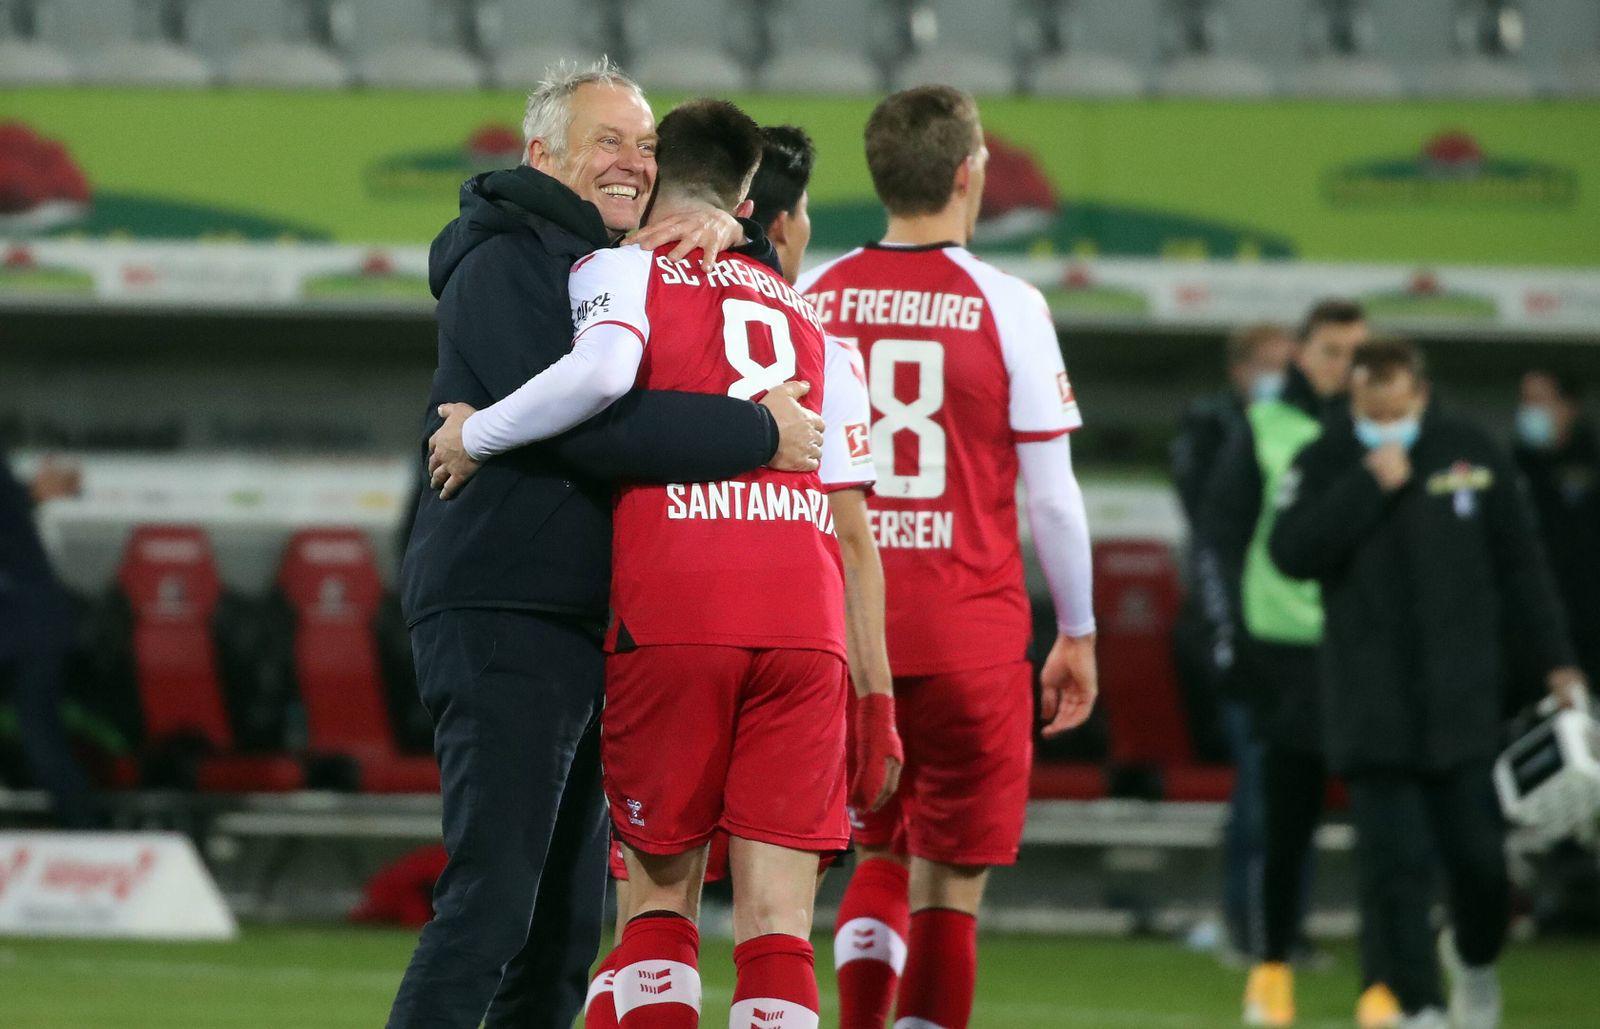 09.01.21 SC Freiburg - 1. FC Köln Deutschland, Freiburg, 09.01.2021, Fussball, Bundesliga, Saison 2020/2021, SC Freibur